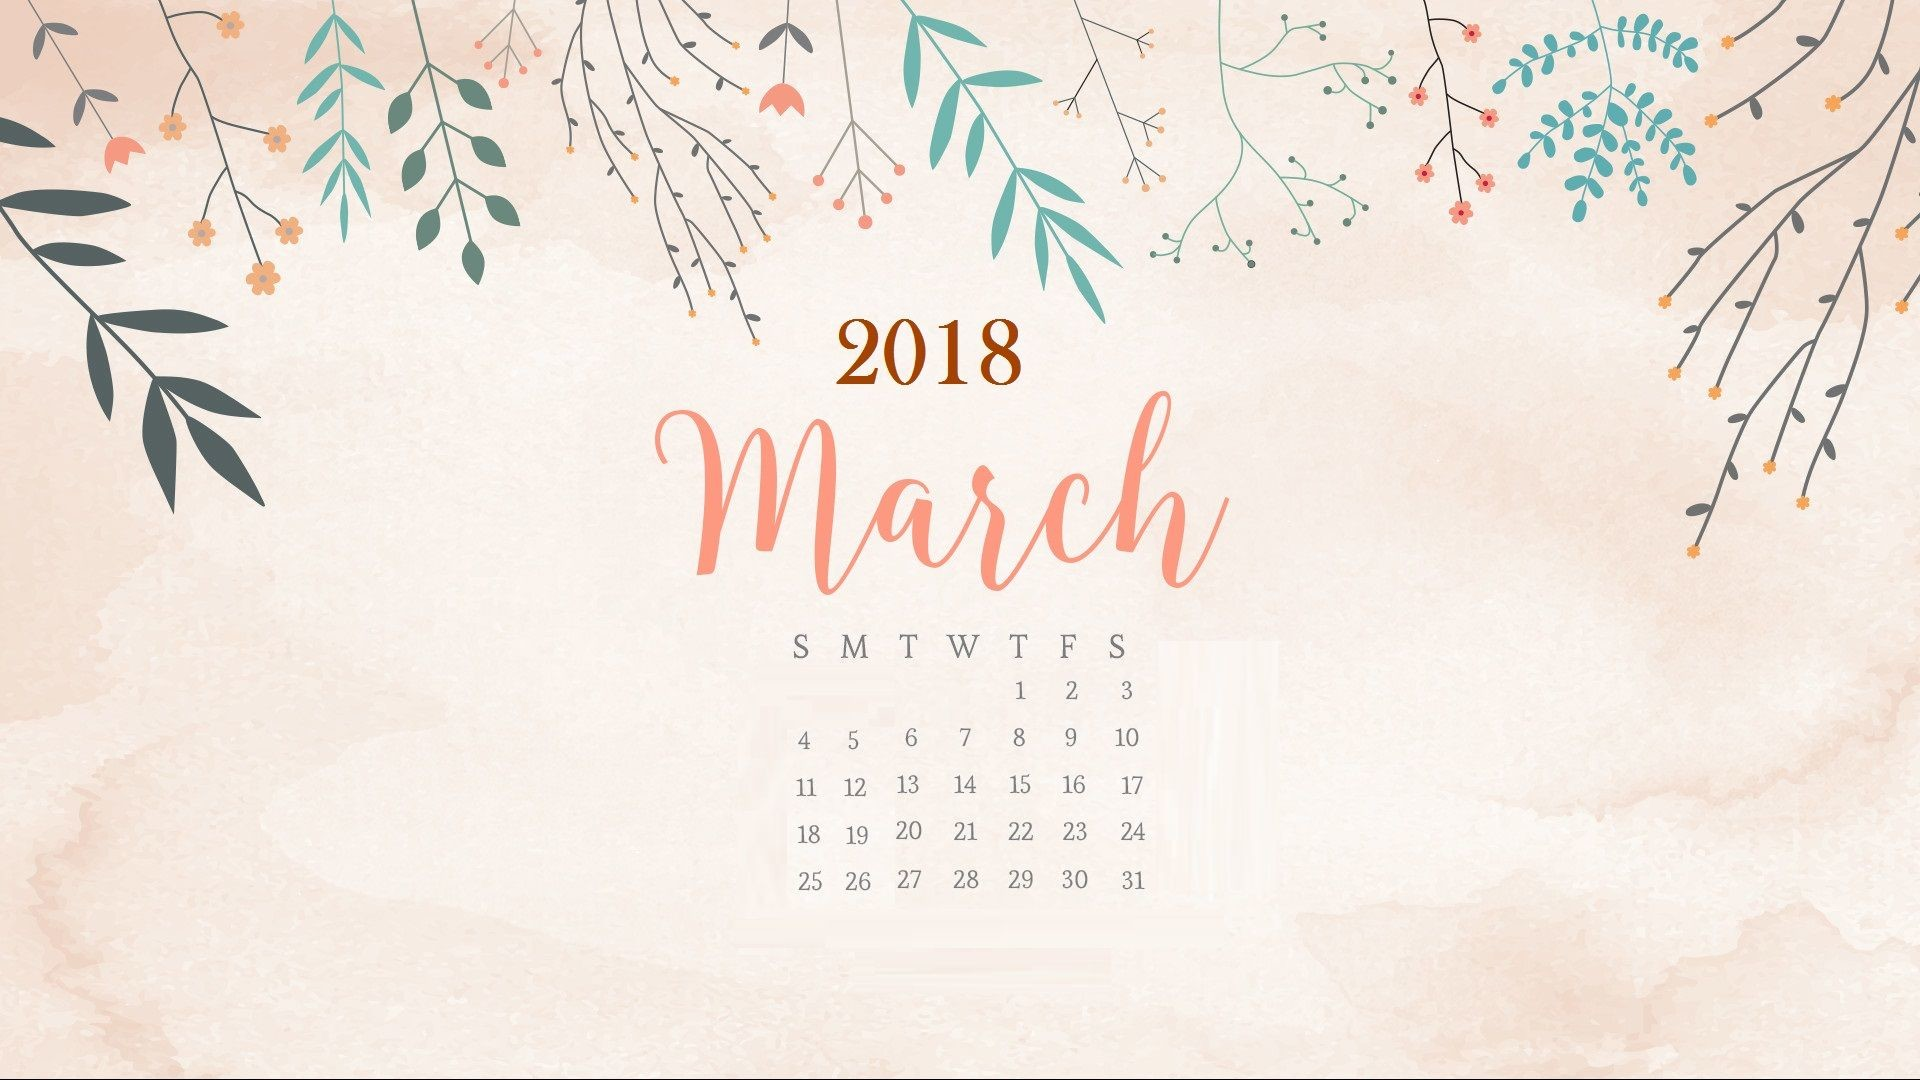 Wallpaper For Computer Calendar 2018 72 Images